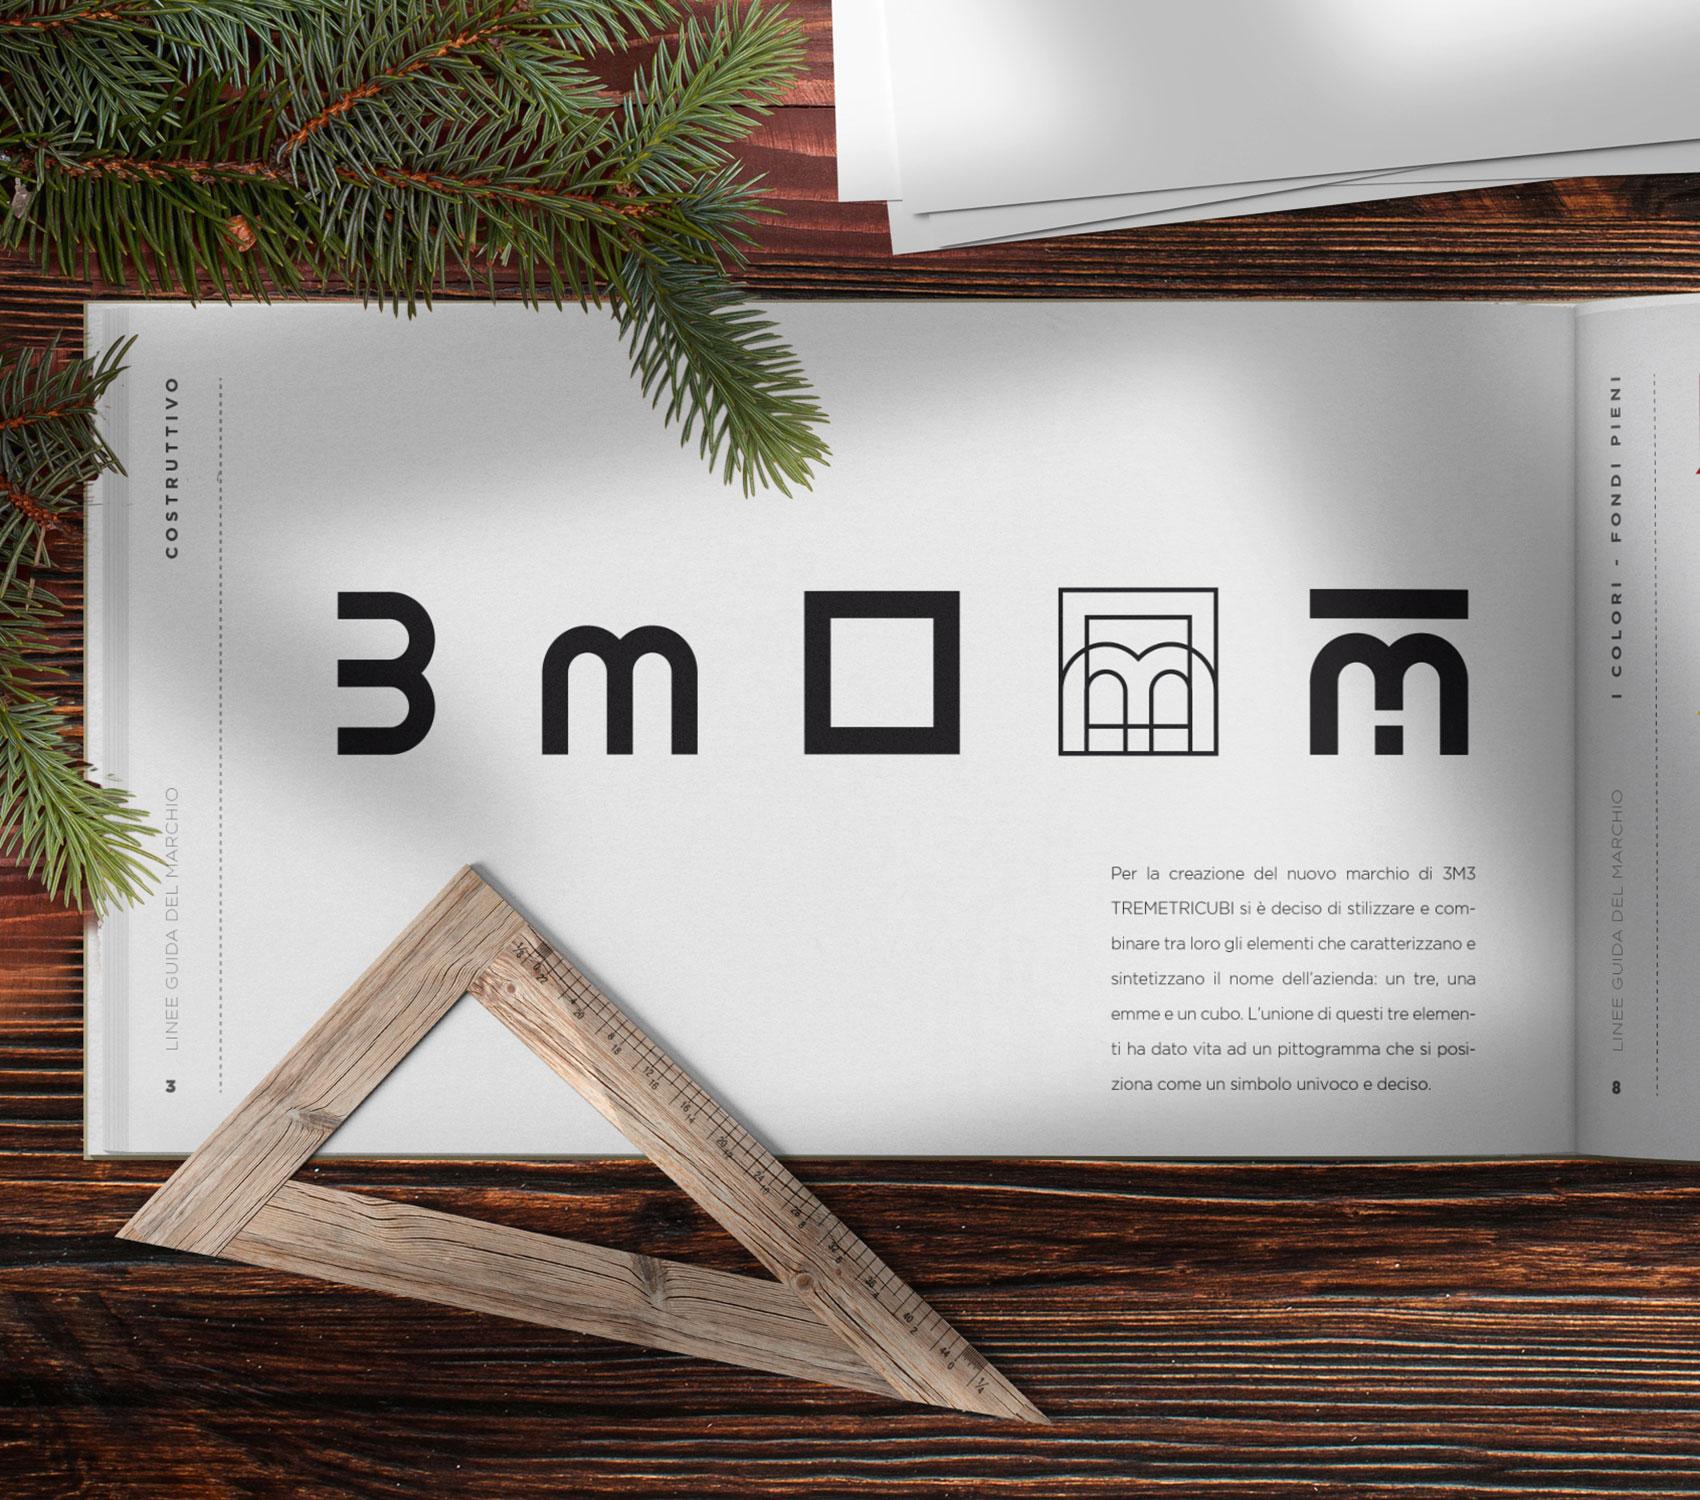 tre metri cubi logo costruttivo